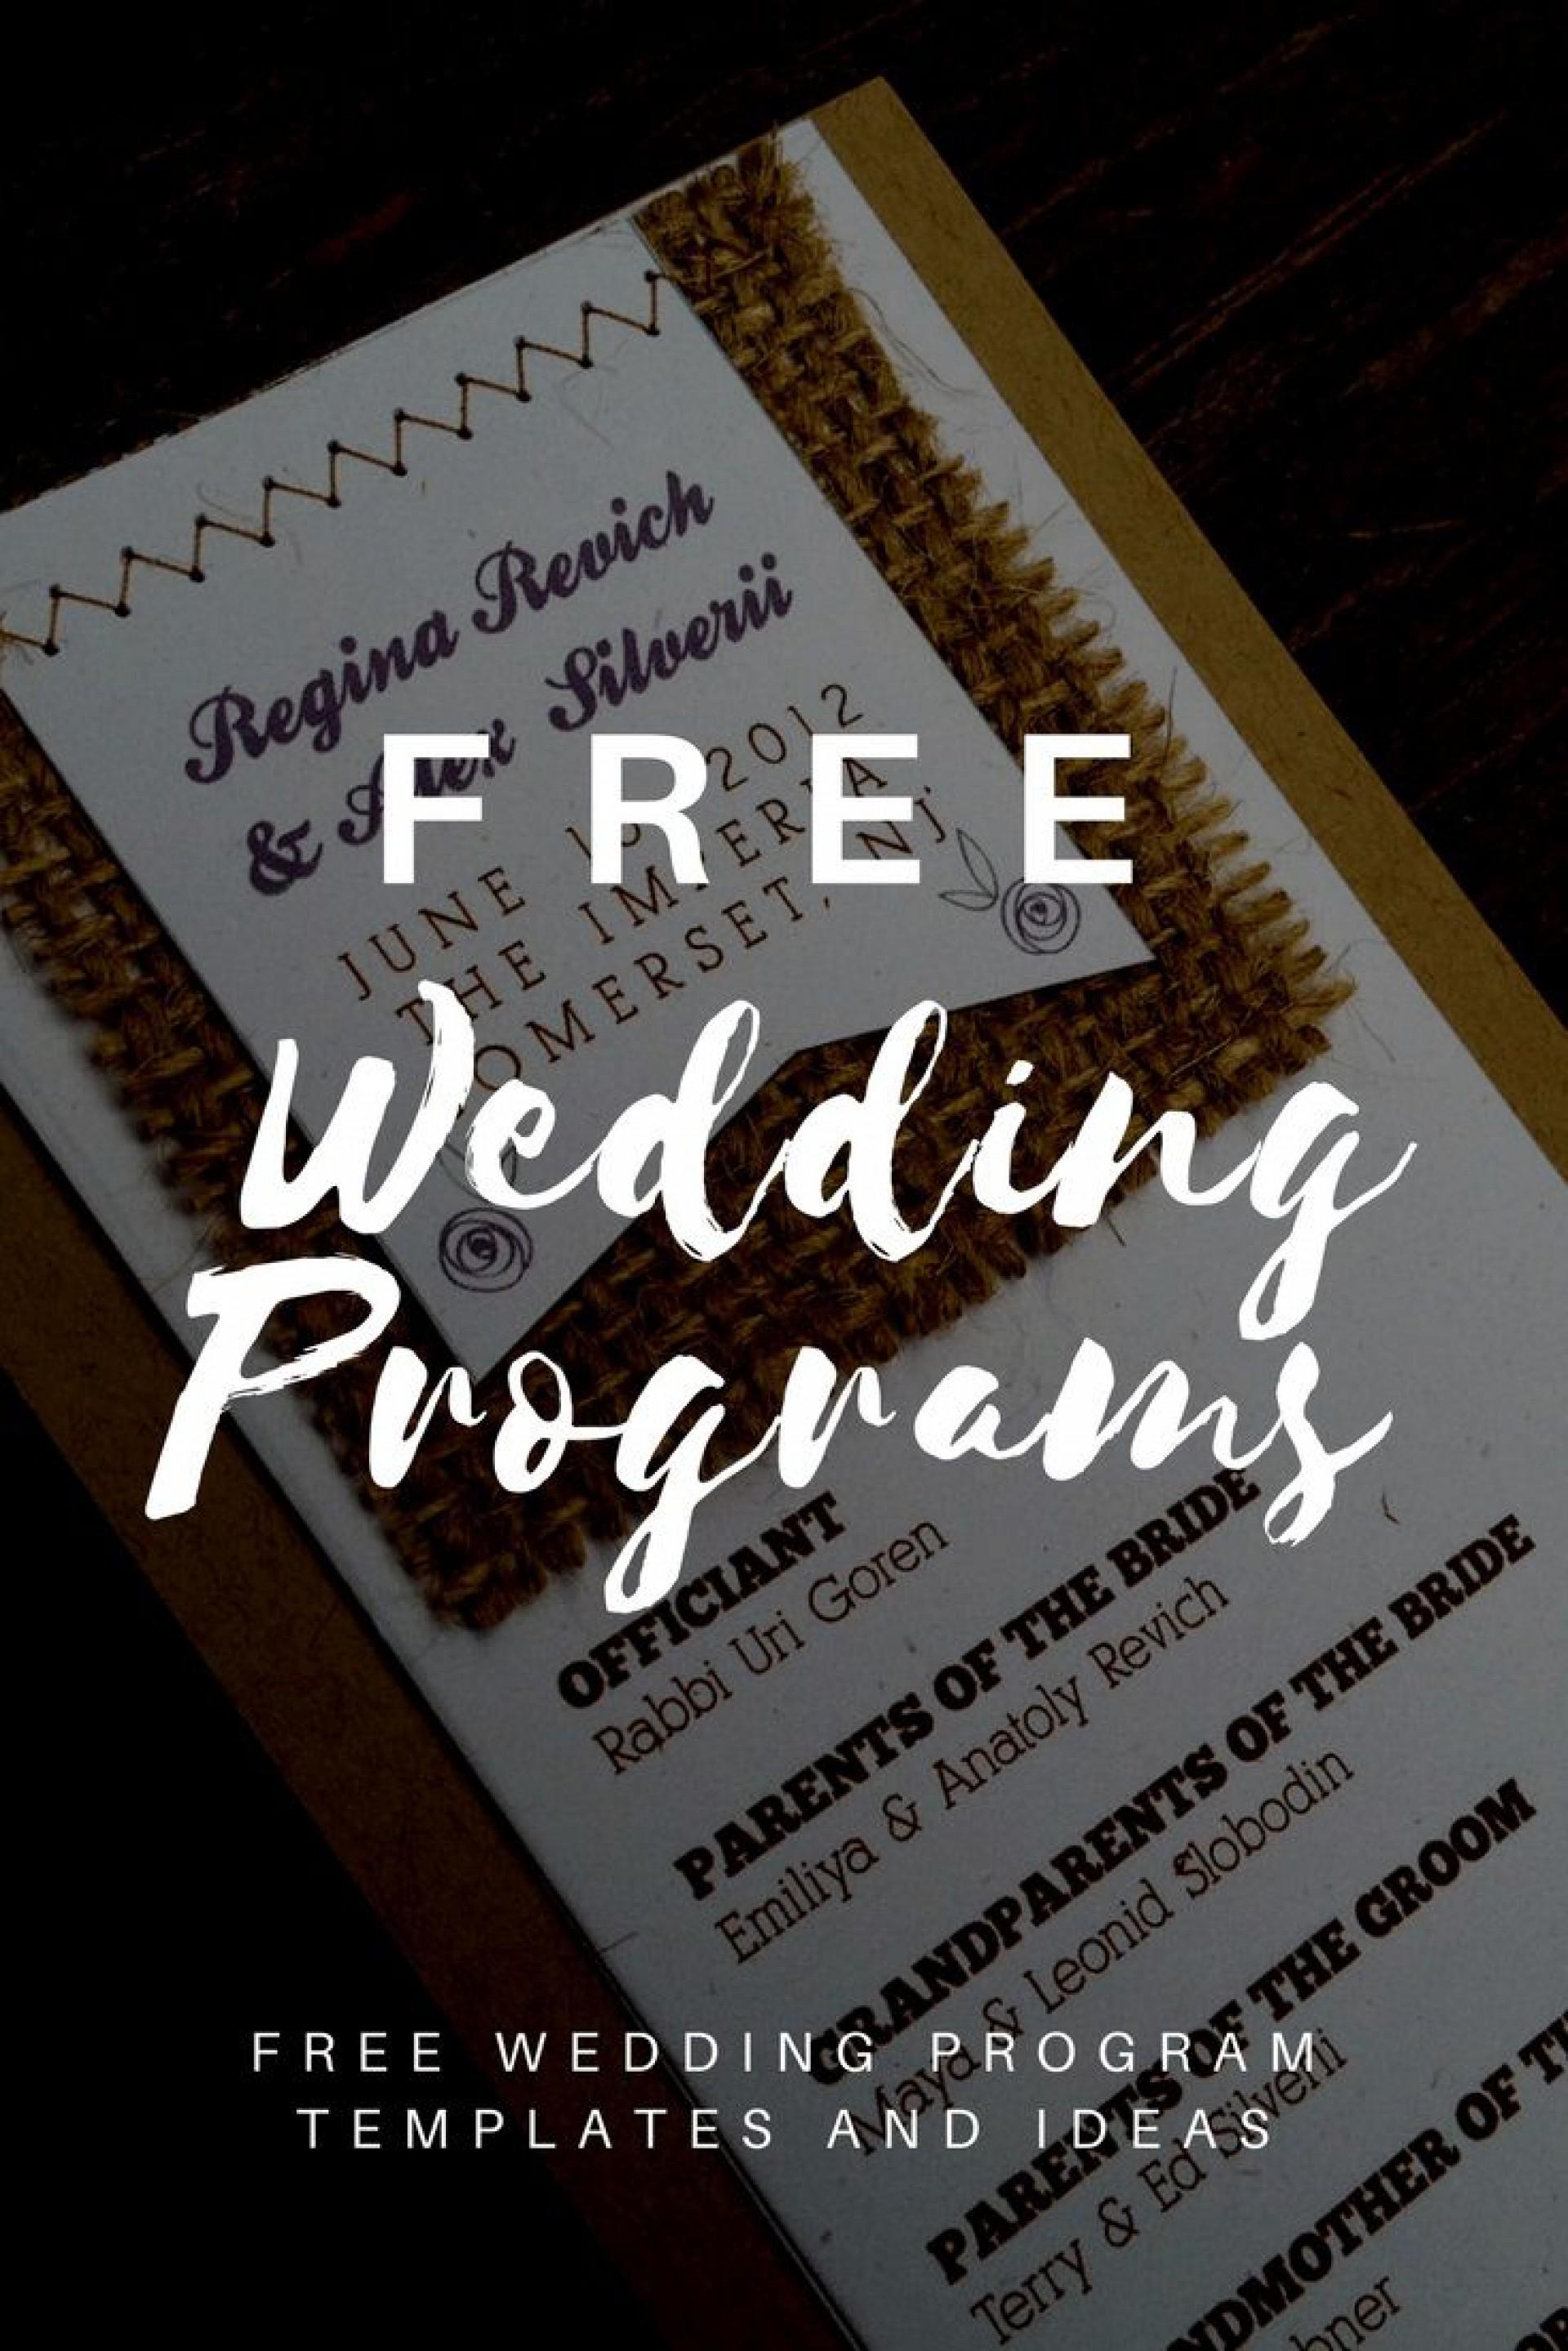 008 Fantastic Trifold Wedding Program Template Concept  Templates Tri Fold Tri-fold Publisher Free Foldable1920